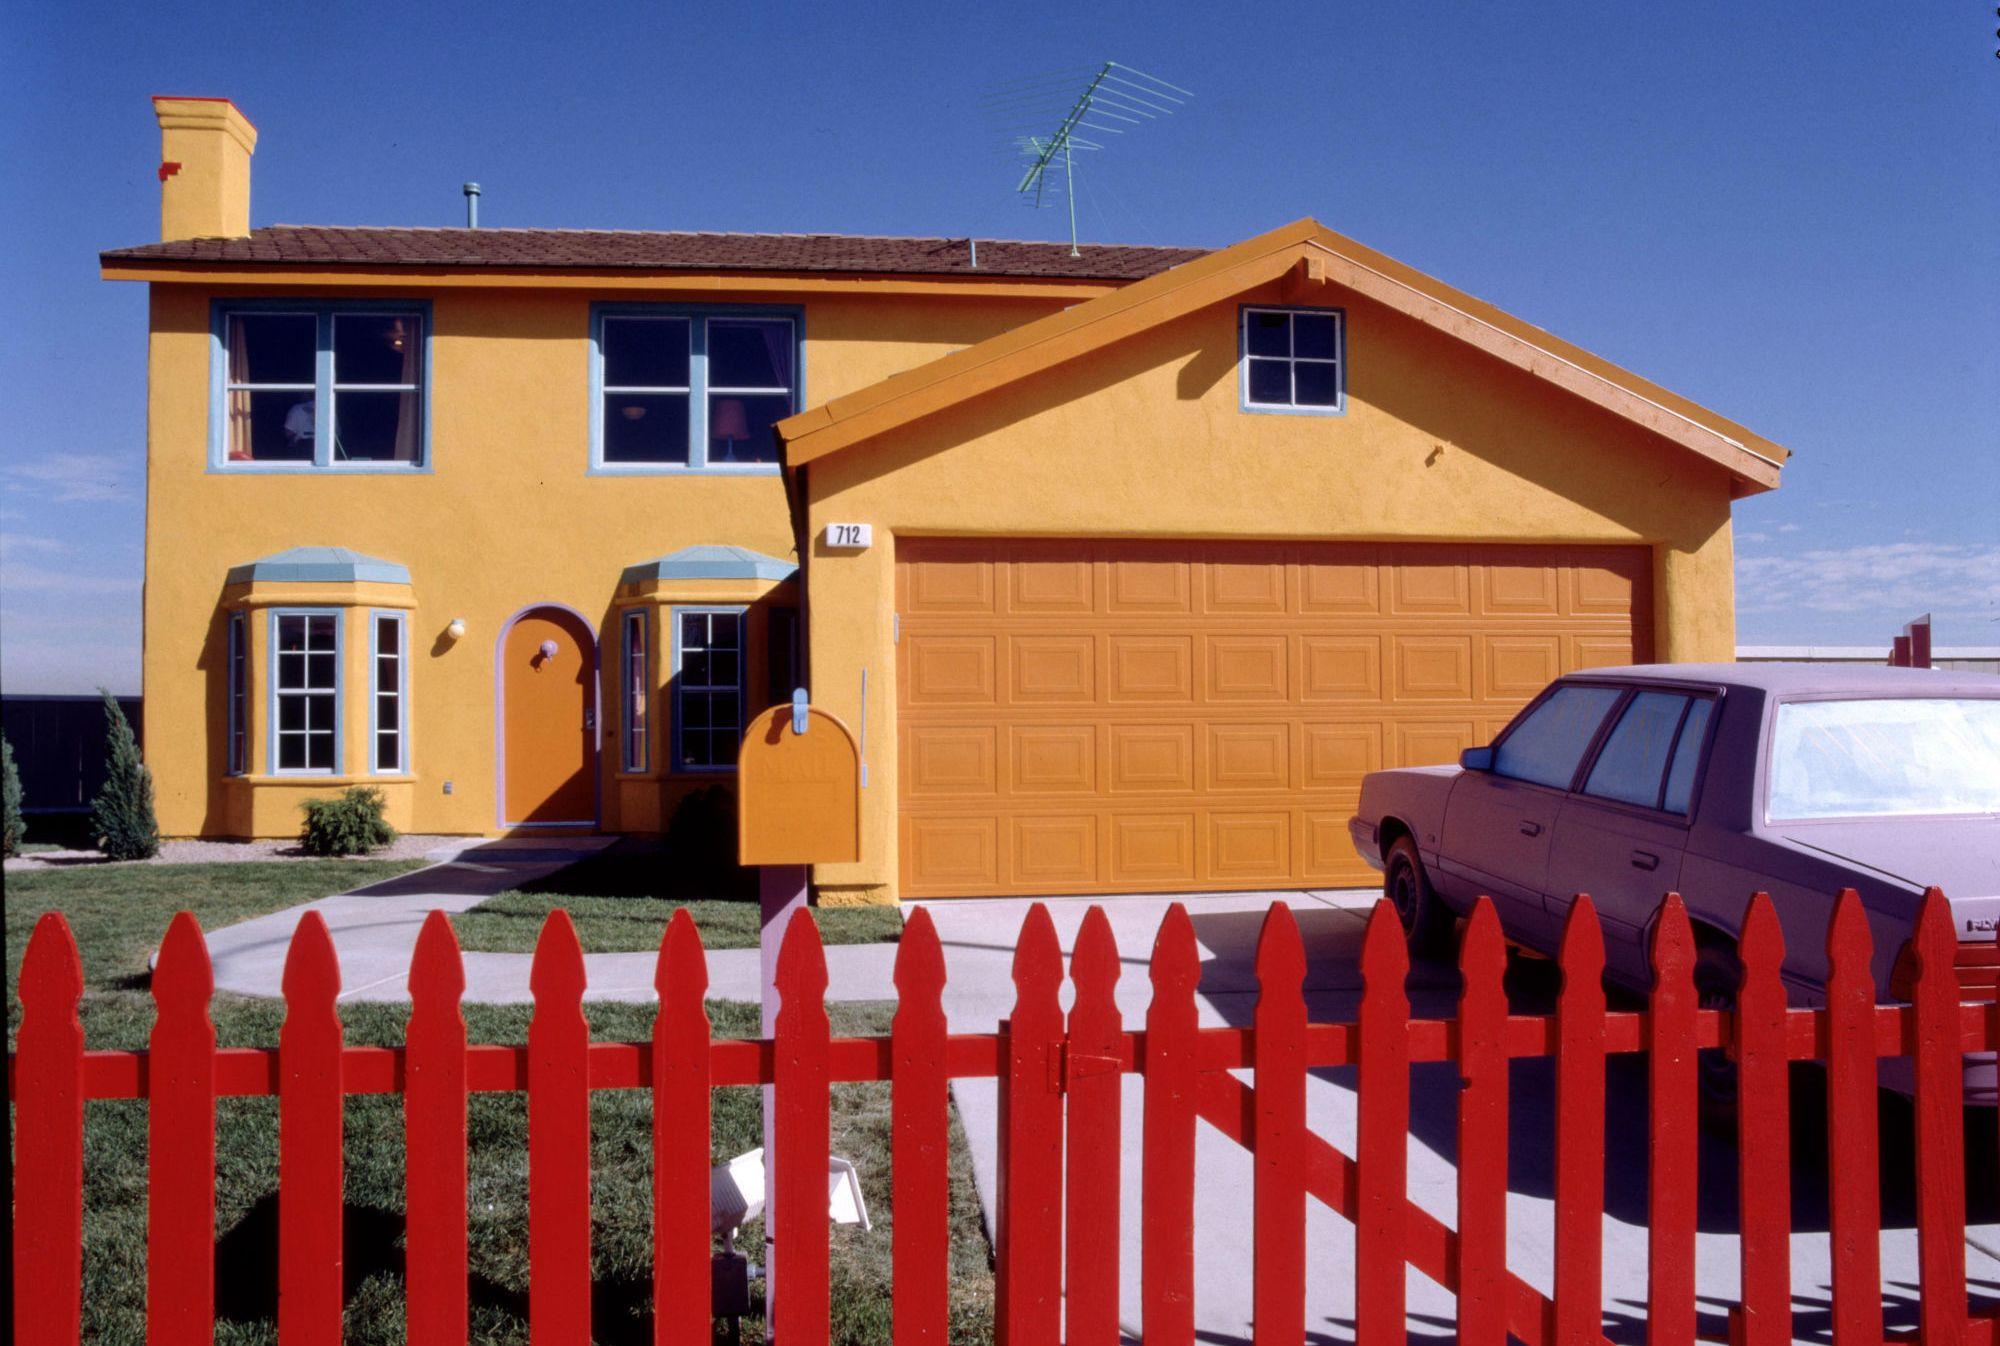 Home Sweet Homer: The Strange Saga of the Real-Life <em>Simpsons</em> House in Nevada